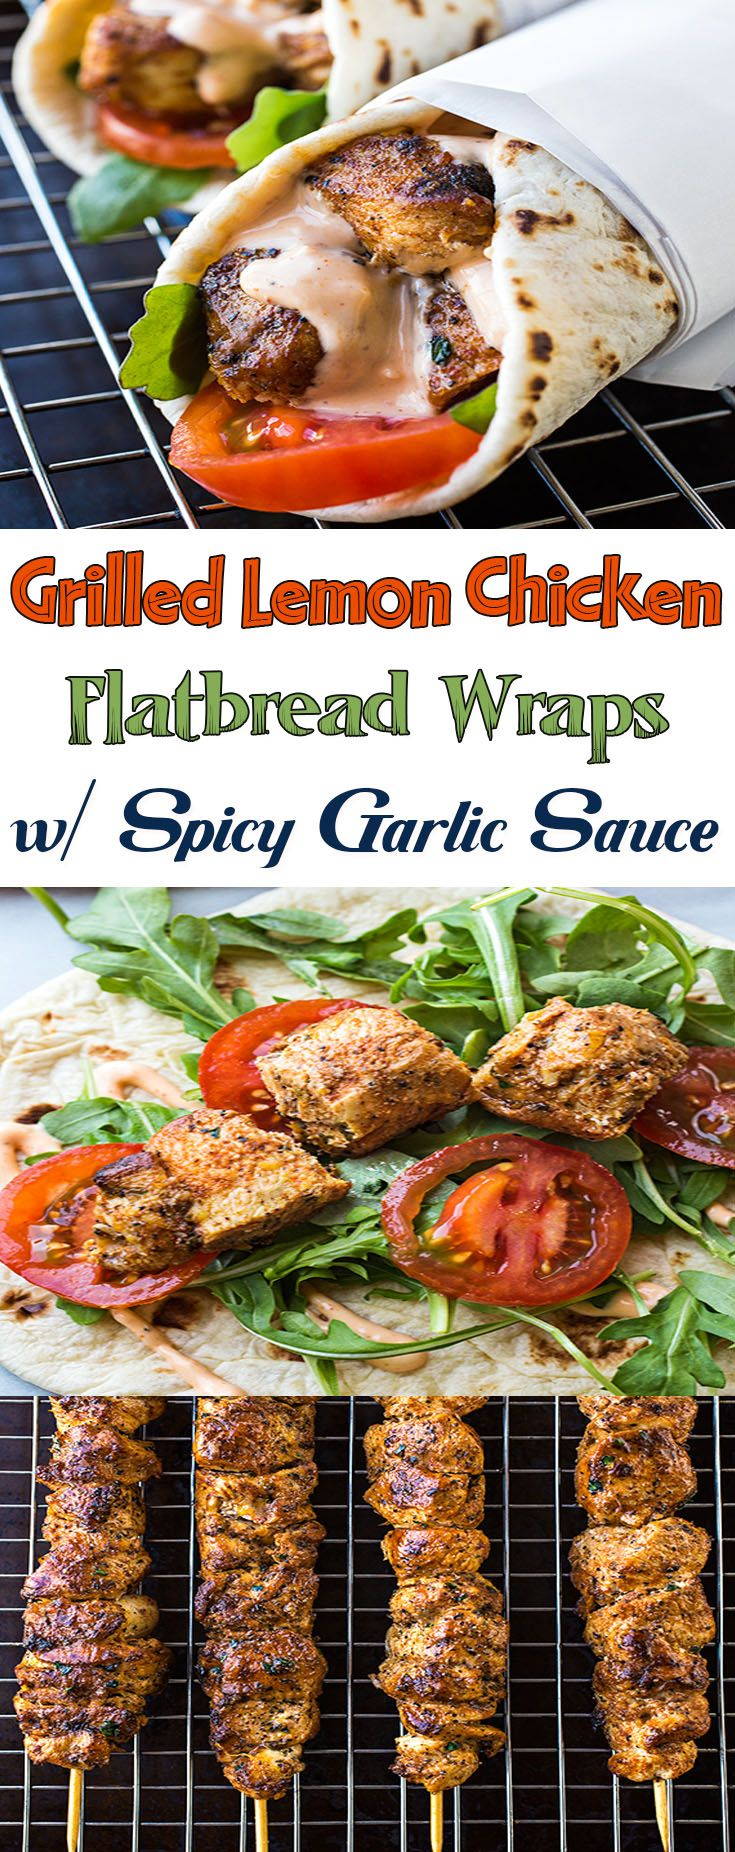 Grilled Lemon Chicken Flatbread Wraps with Spicy Garlic Sauce